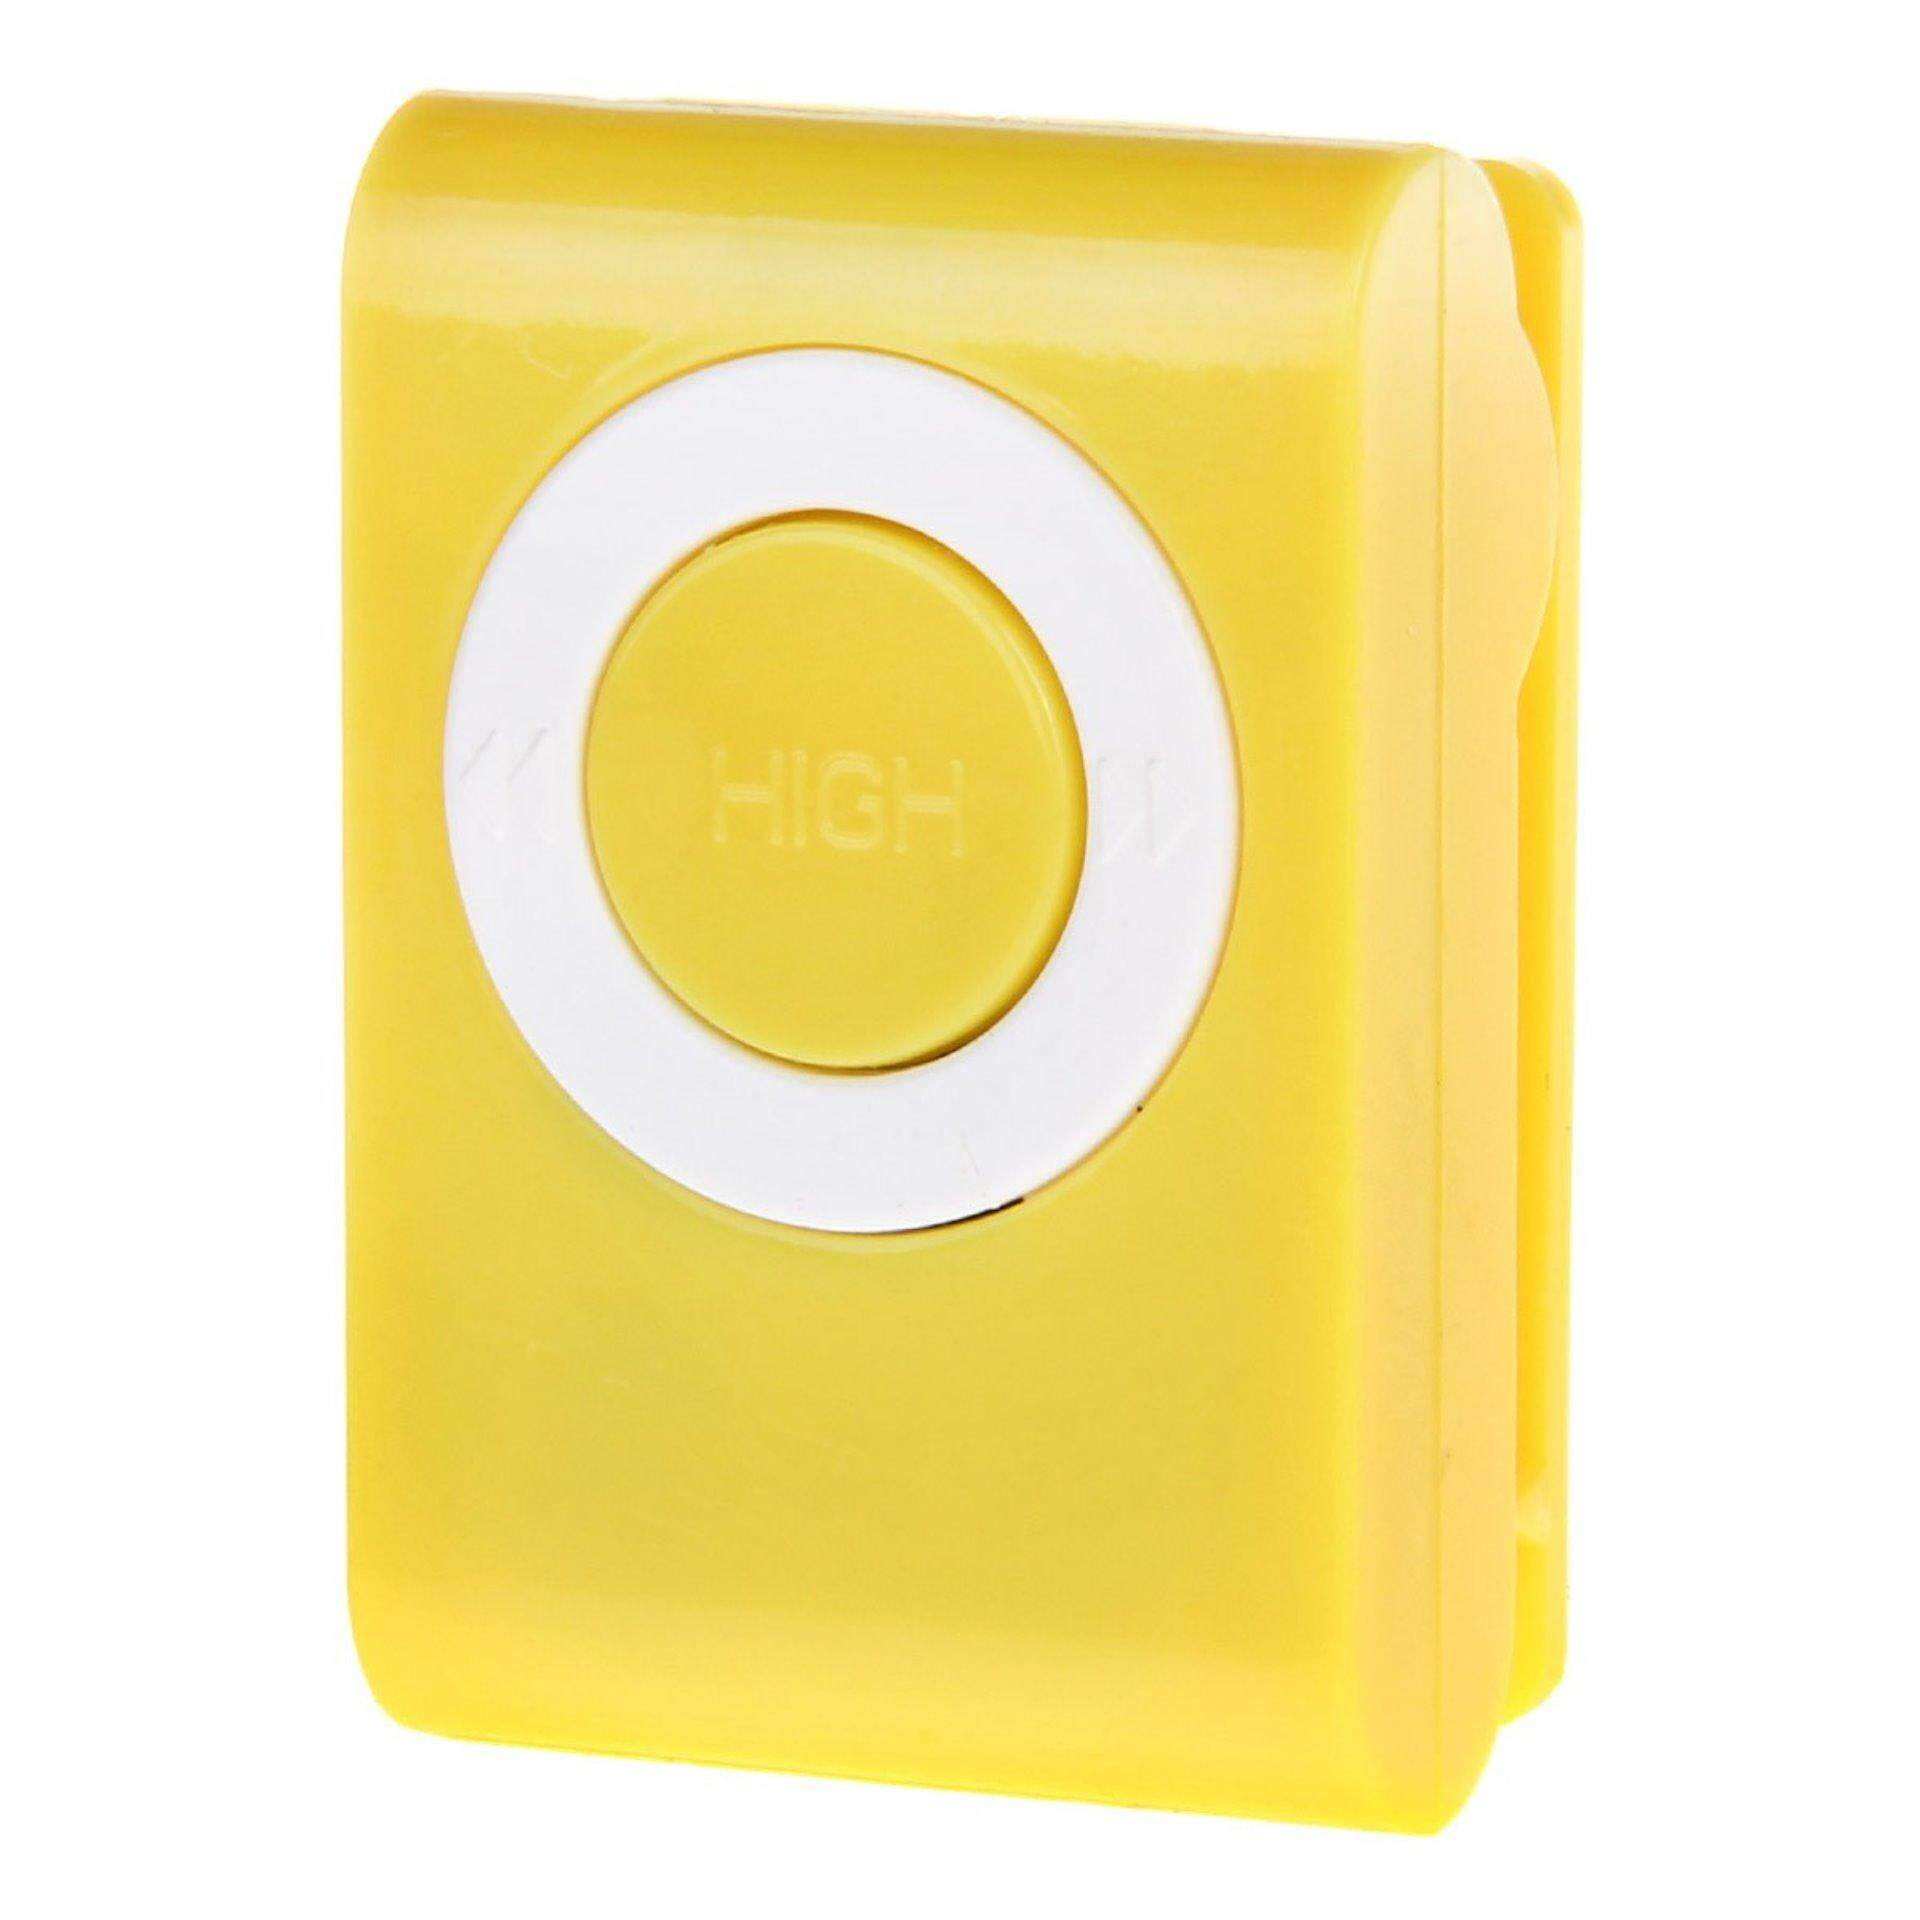 Sex Masturbator 20 Speed MP3 Shape Mini Bullet Wireless Remote Control Vibrator Egg - YELLOW